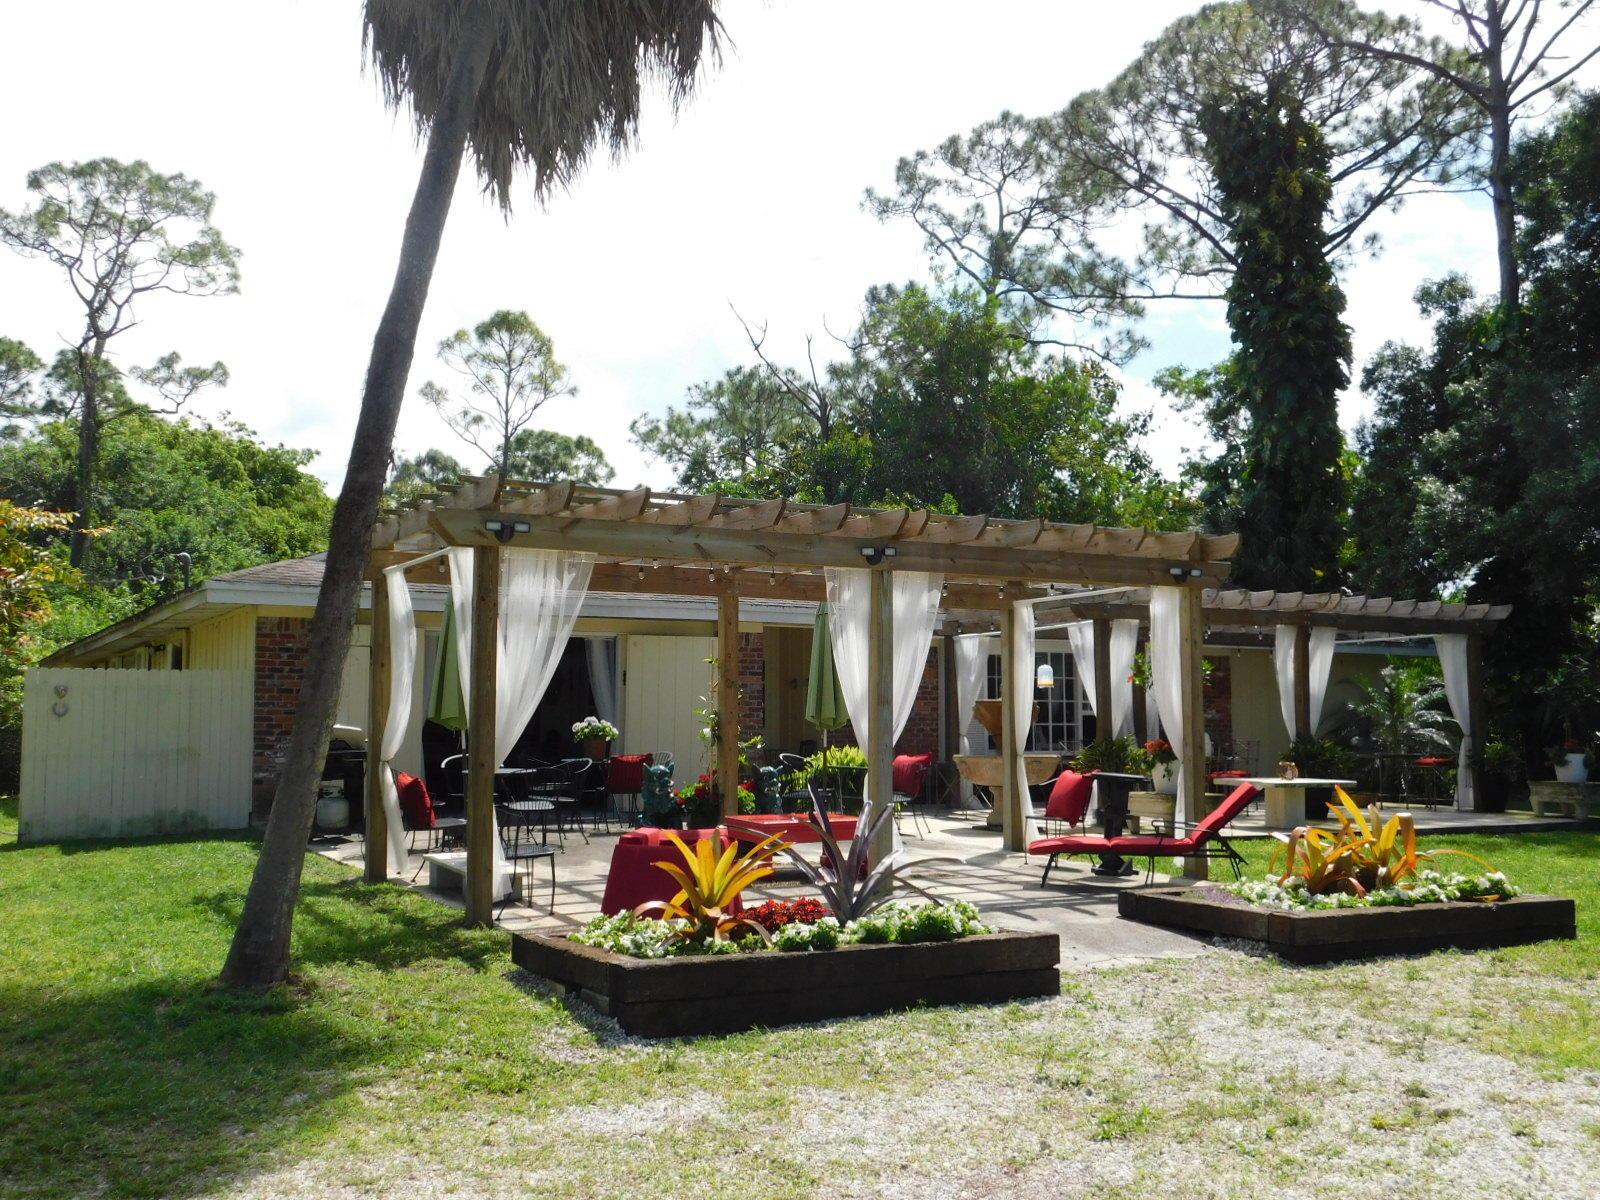 3830 C Road, Loxahatchee Groves, Florida 33470, 3 Bedrooms Bedrooms, ,2 BathroomsBathrooms,Single Family,For Sale,C,RX-10515208